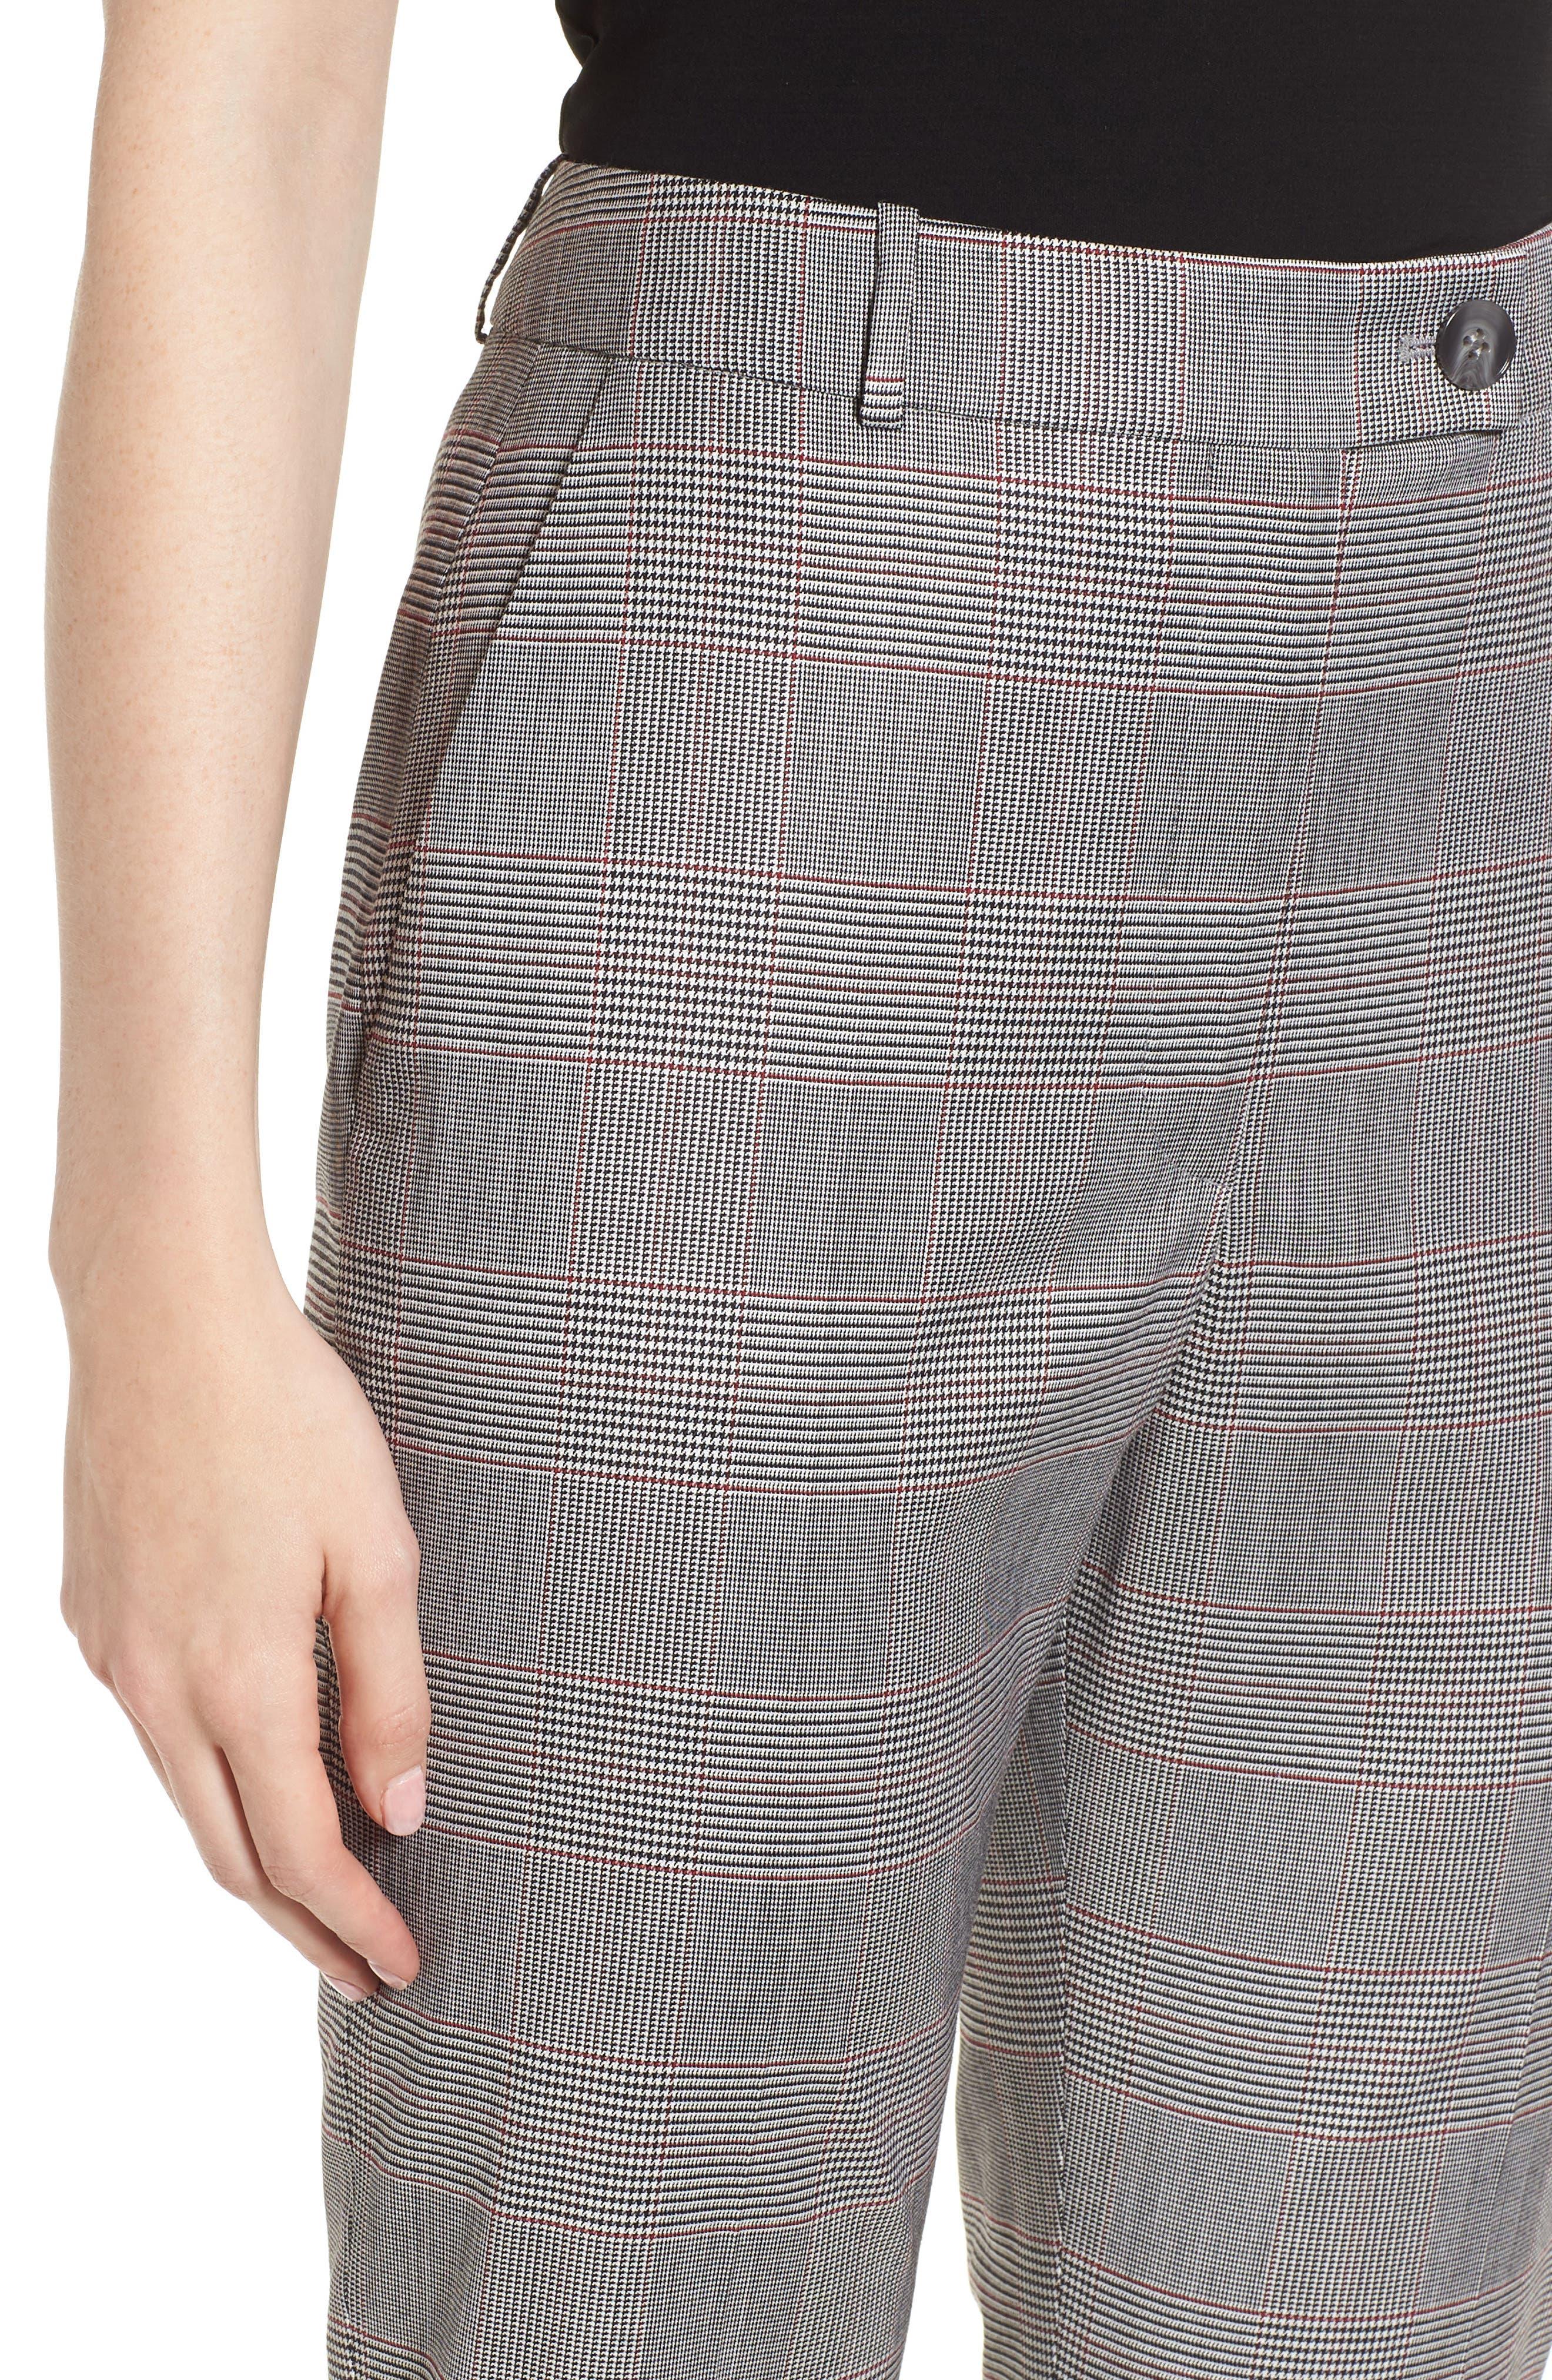 Tofilia Glencheck Slim Fit Trousers,                             Alternate thumbnail 4, color,                             Dark Sunset Orange Fantasy